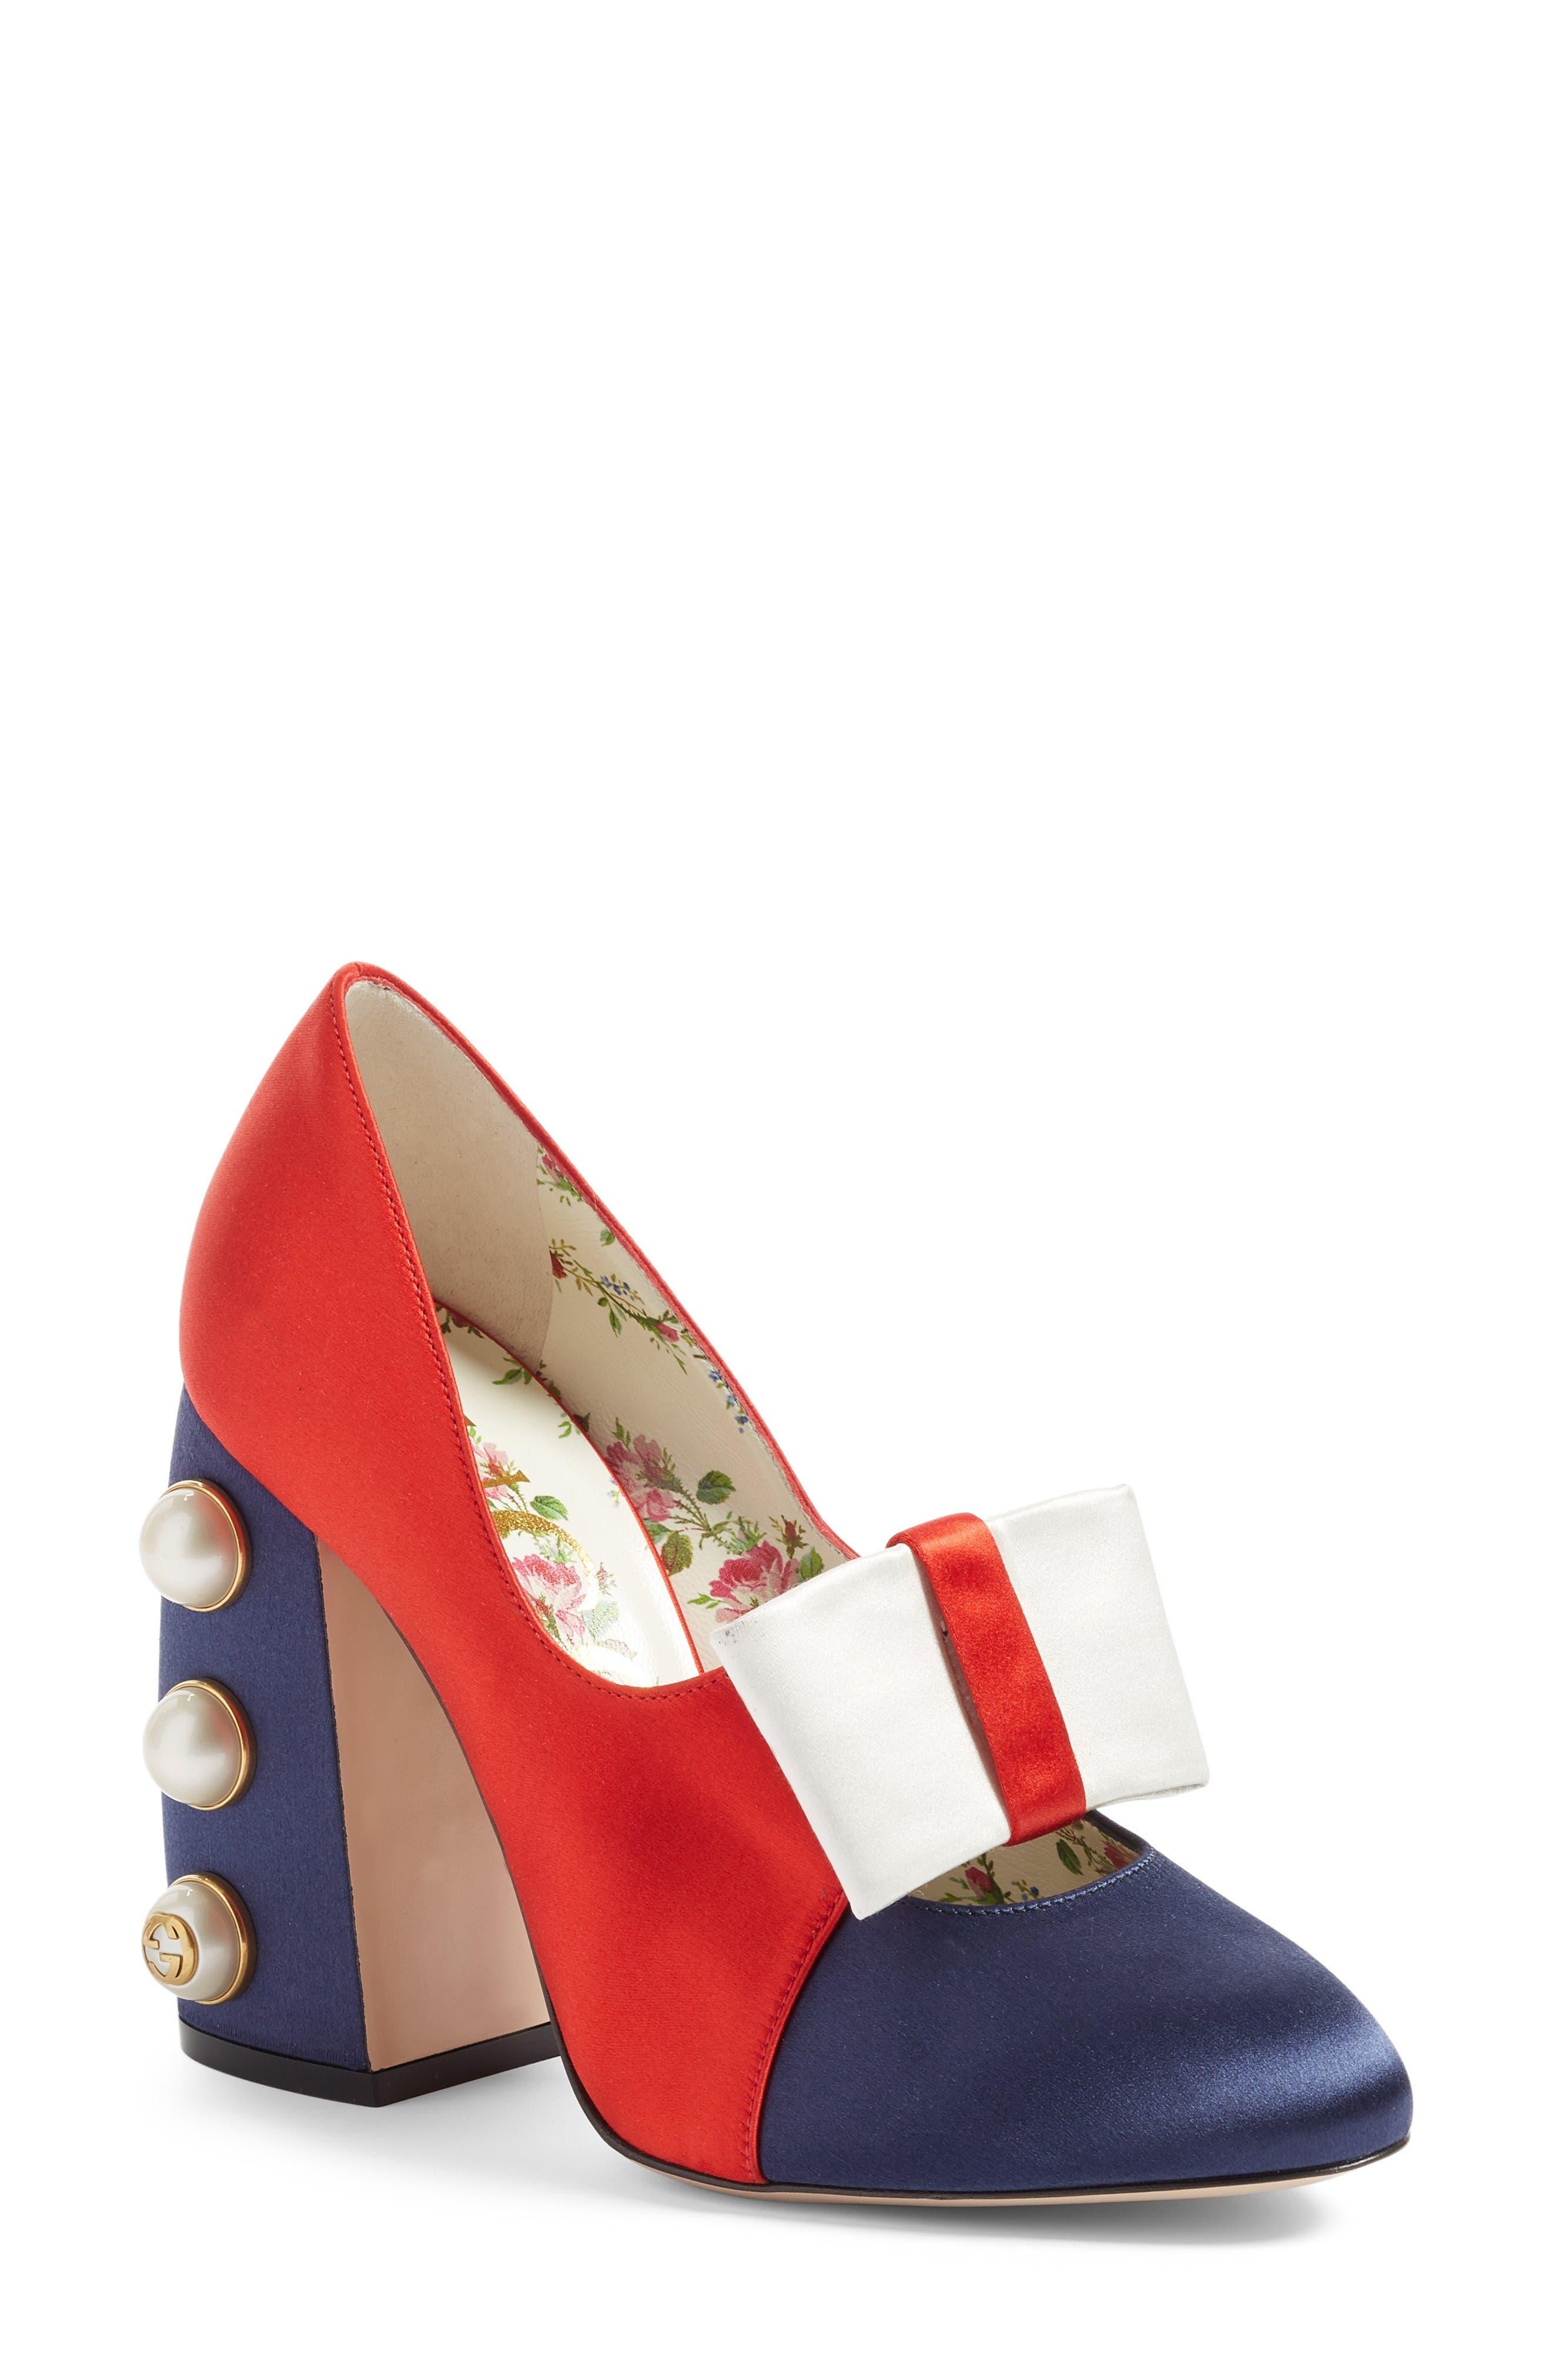 Luna Block Heel Pump,                         Main,                         color, Red Multi Satin